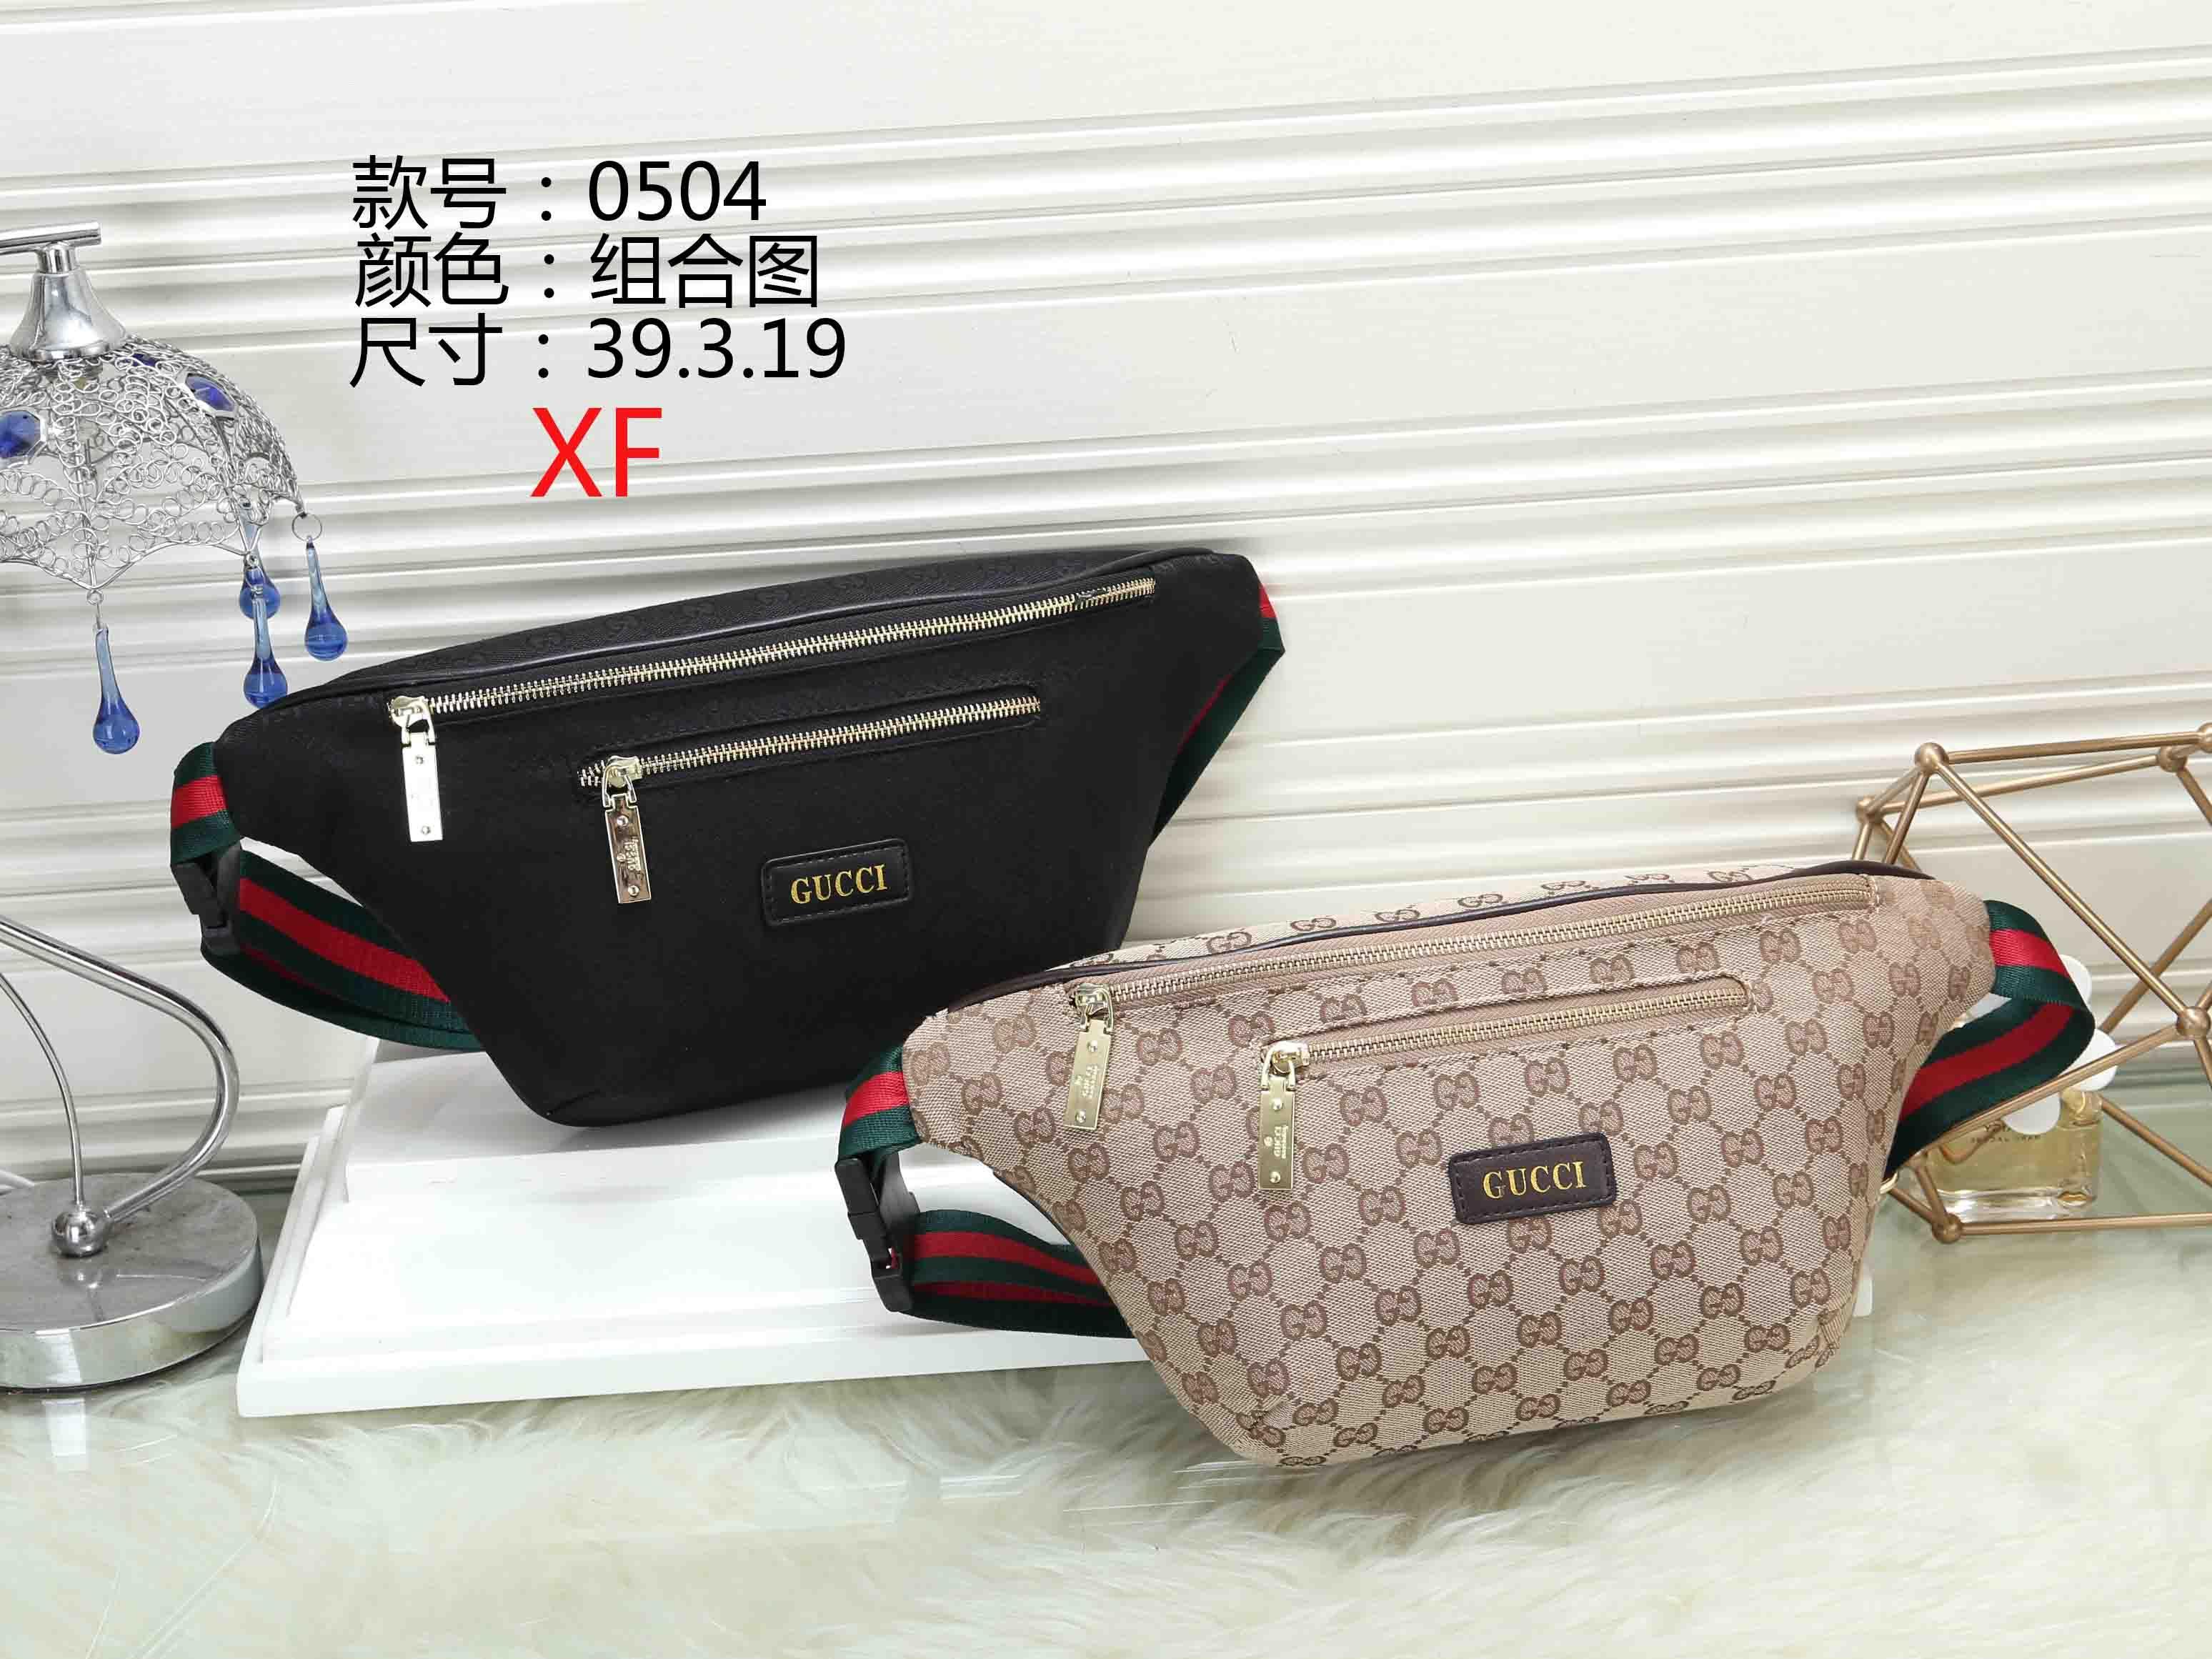 1618bfe8af40 2018 Men S Shoulder Luxury G Bag Designer Cross Body Satchel Women Handbag  Small Pouch PU Waist Bags   1720 Messenger Bags For Men Leather Handbags  From ...